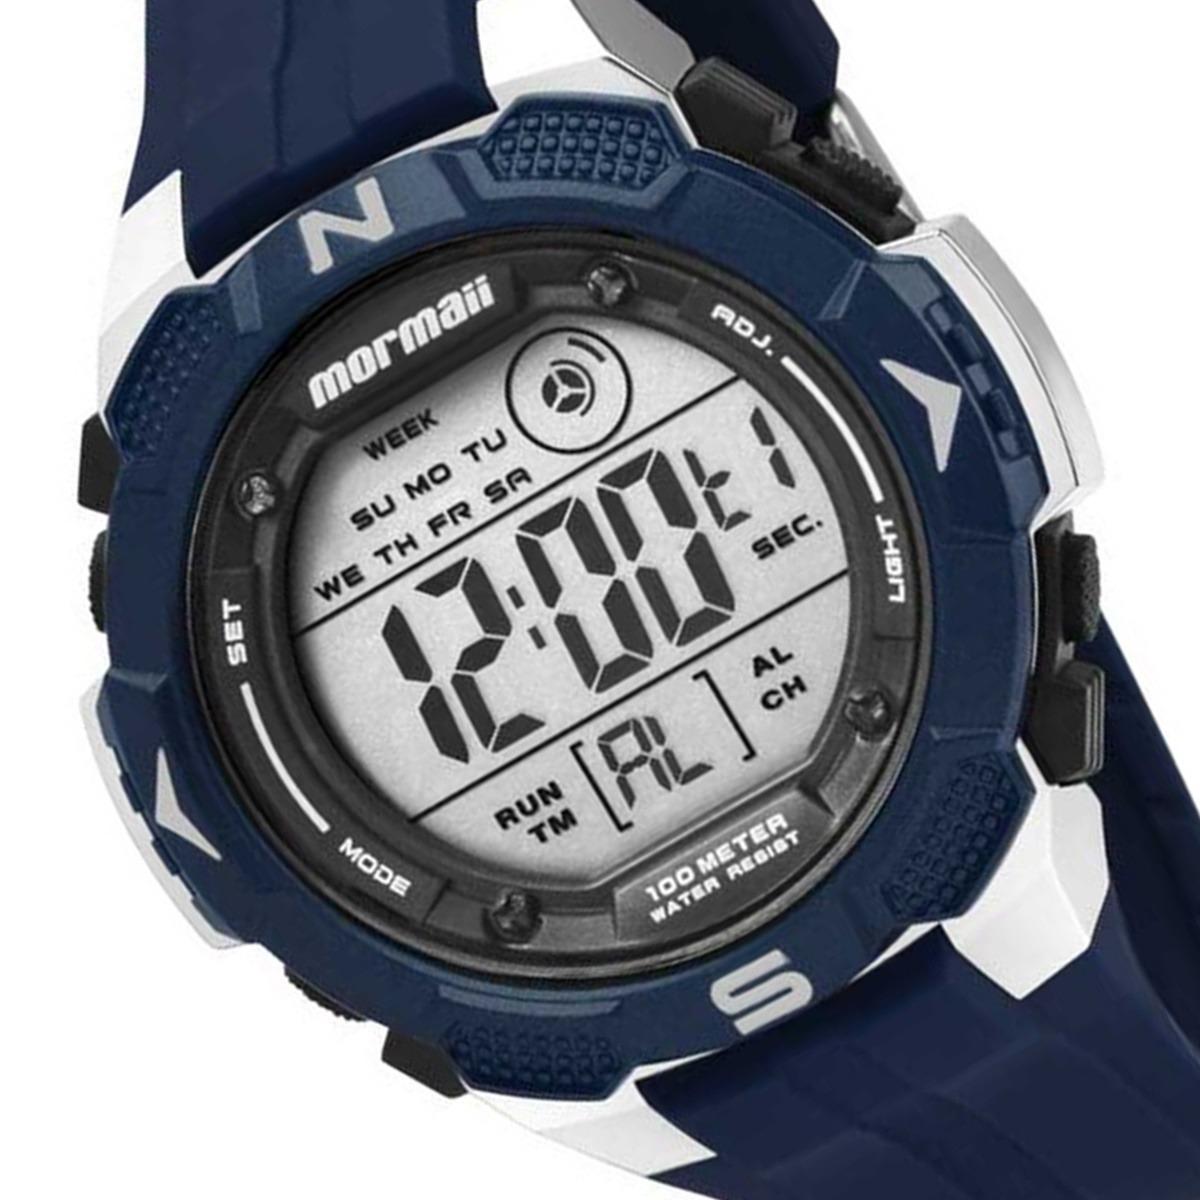 f4f48d52d41 Relógio Esportivo Mormaii Masculino Digital 100m Mo2908 8a - R  238 ...